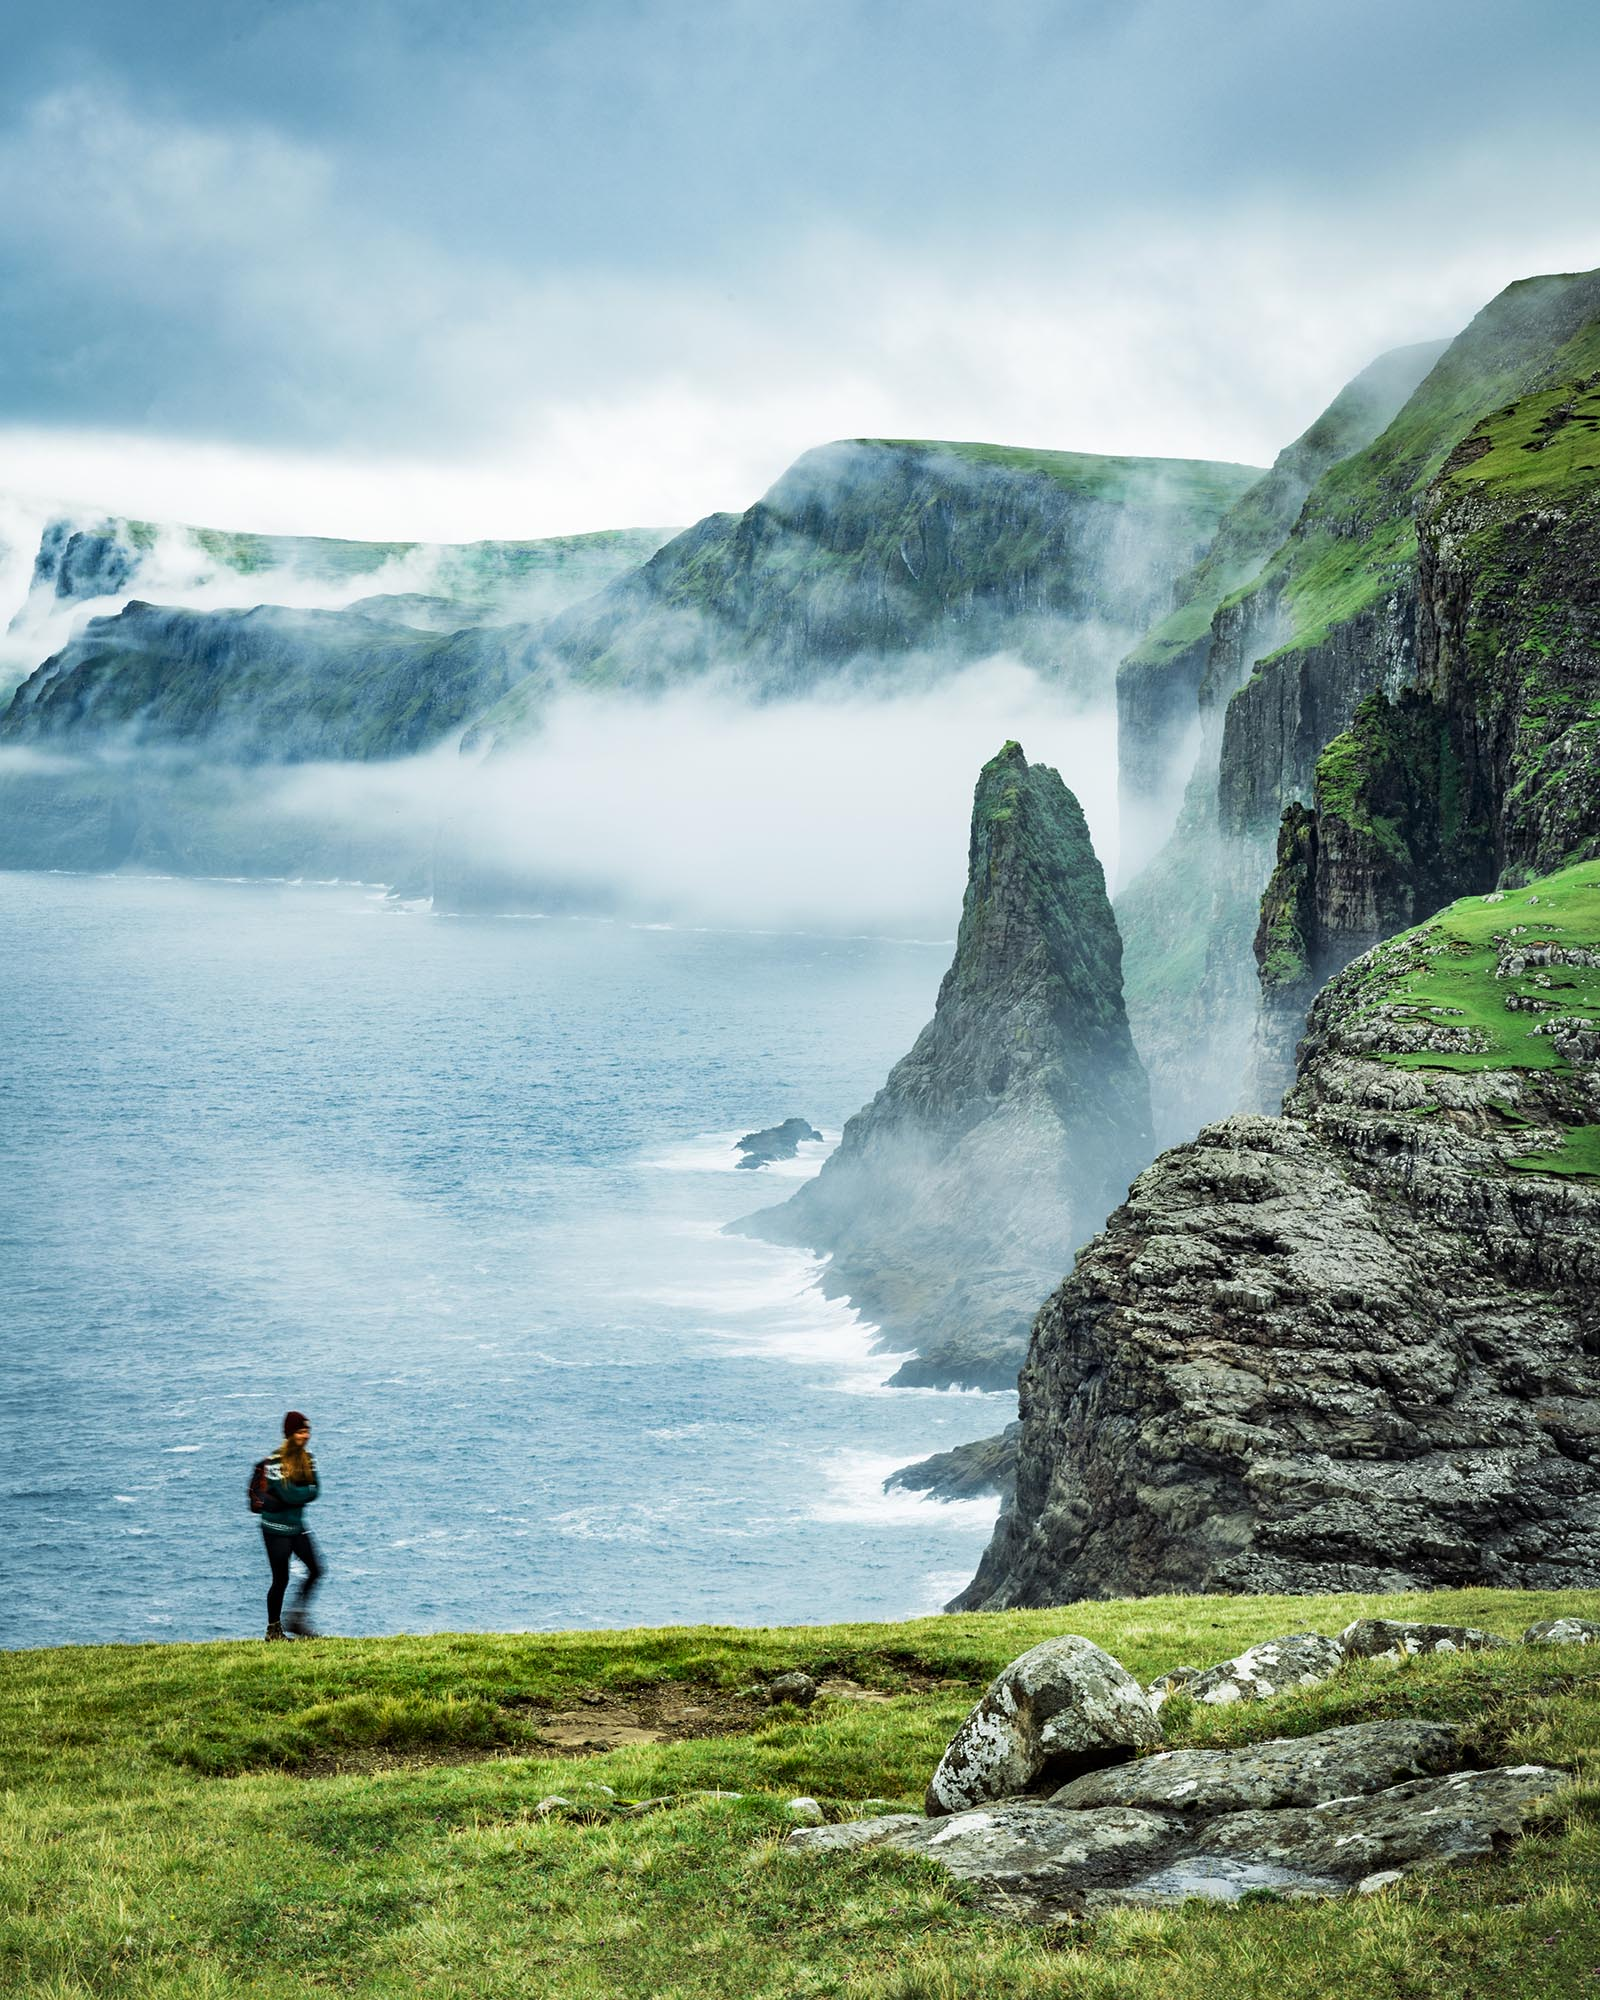 Trælanípan / Leitisvatn, Faroe Islands